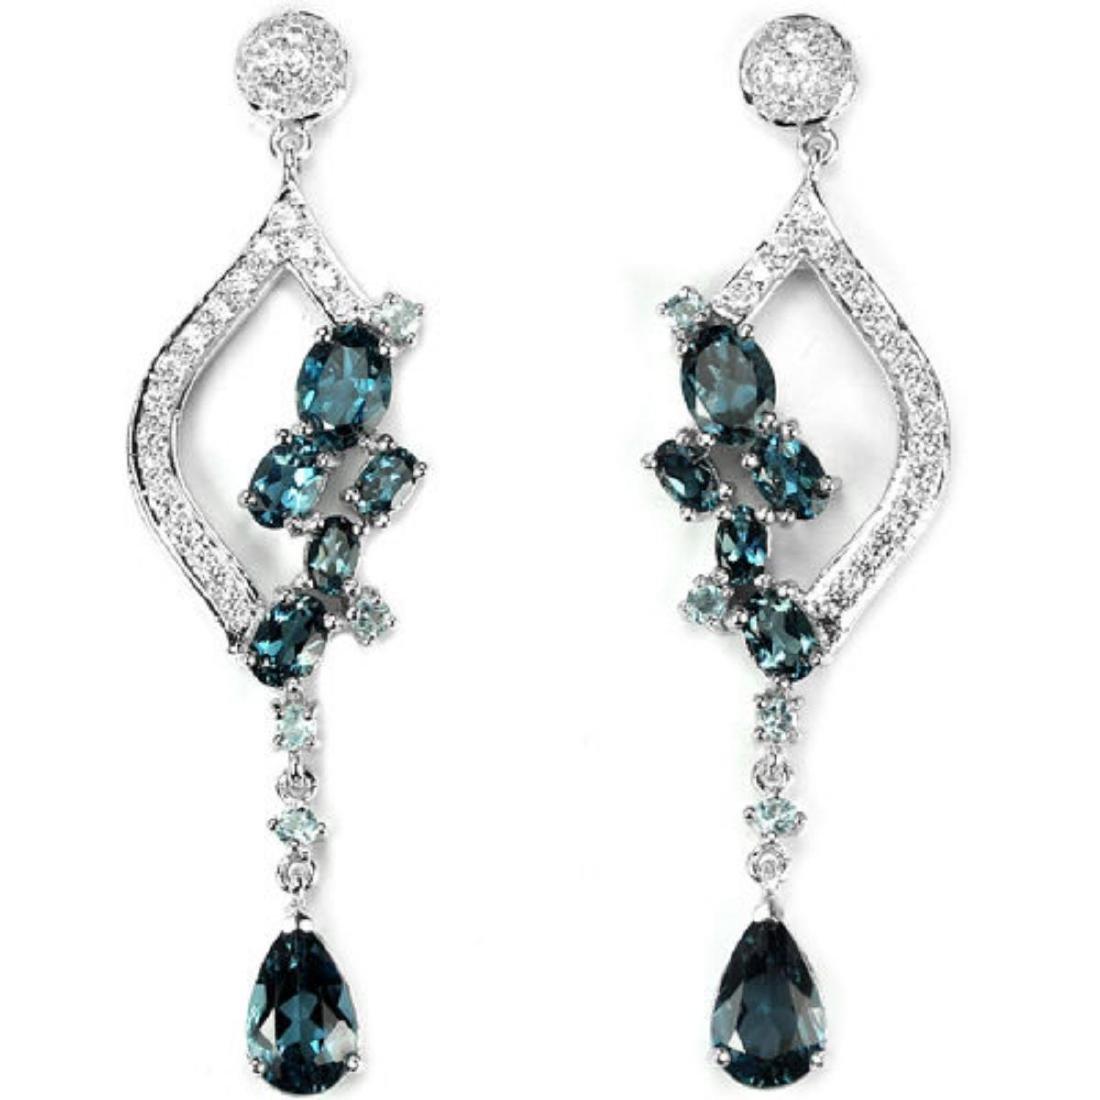 Natural London Blue Topaz 75 Carats Earrings